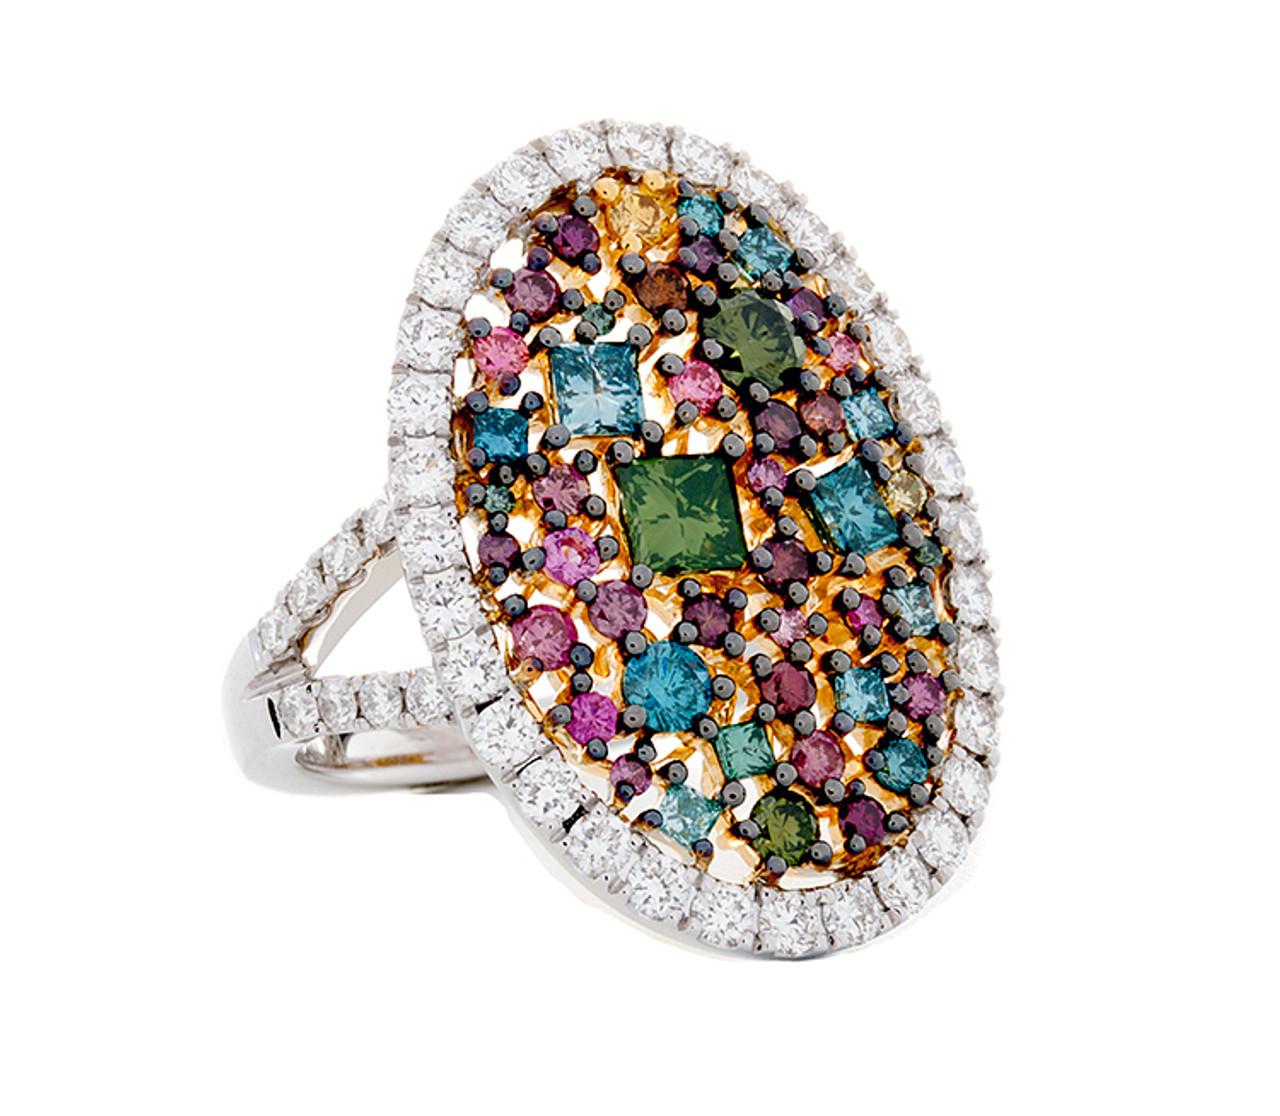 c1321d20de1fe SIE10855 MULTI COLOR DIAMOND RING 18K